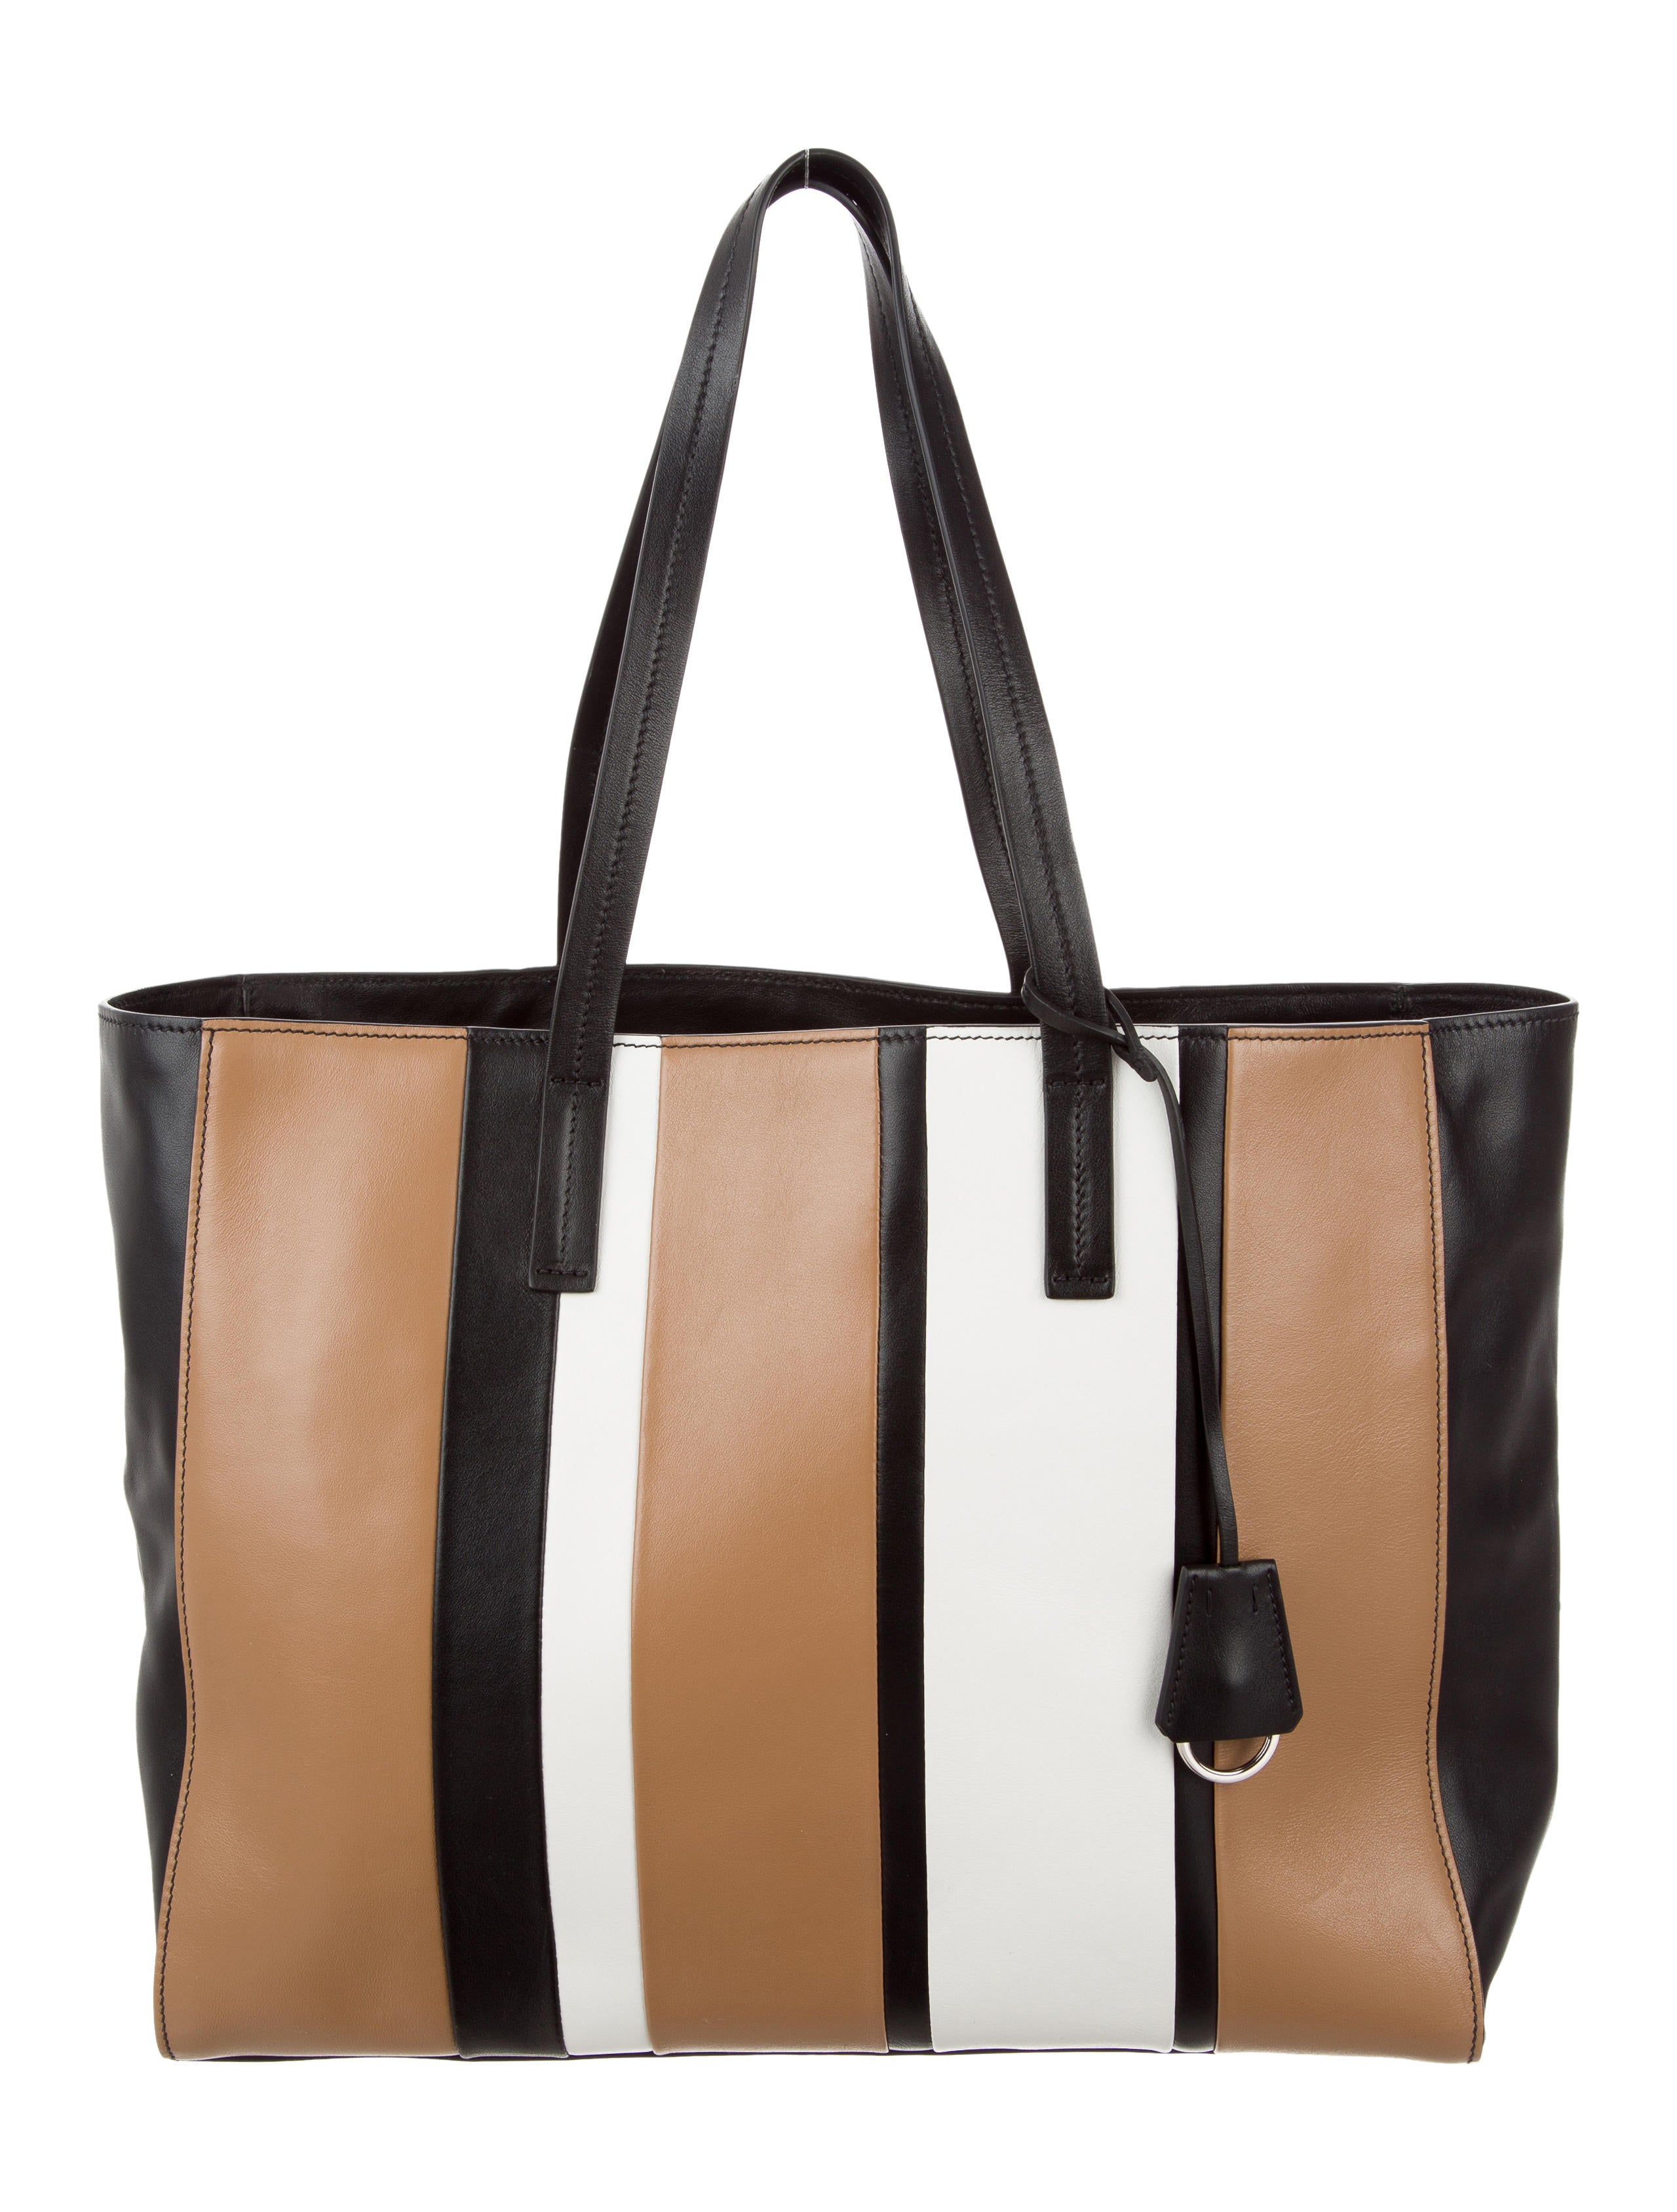 7c33590cc228bc Prada Baiadera Calf Striped Tote - Handbags - PRA161787   The RealReal